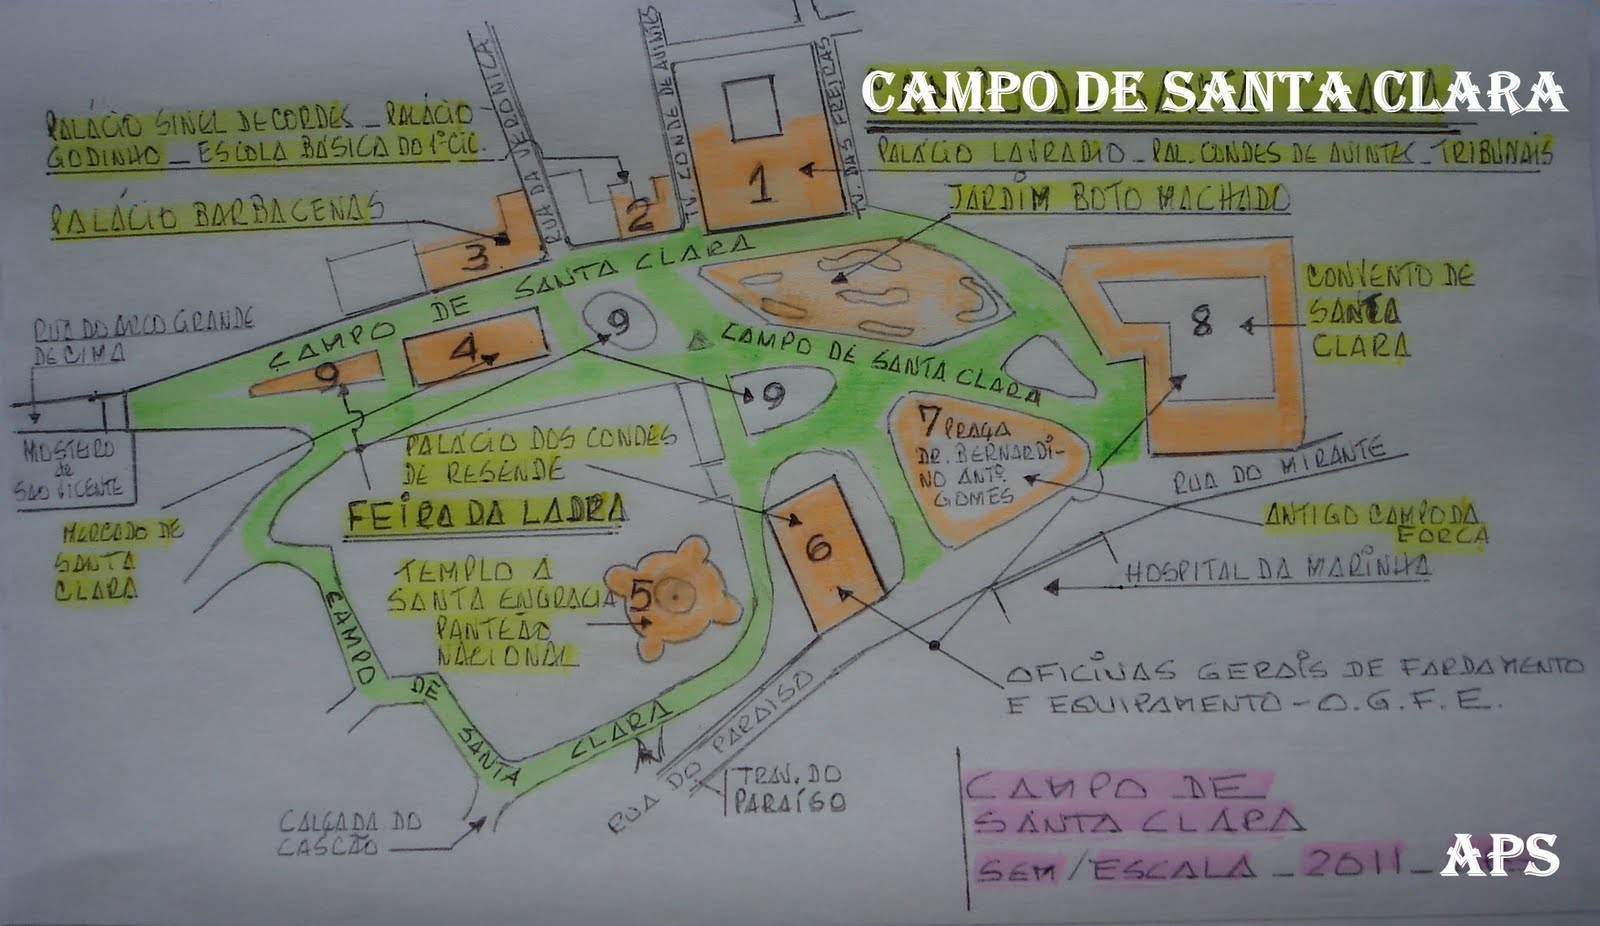 campo de santa clara lisboa mapa RUAS DE LISBOA ALGUMA HISTÓRIA: CAMPO DE SANTA CLARA [ I ] campo de santa clara lisboa mapa